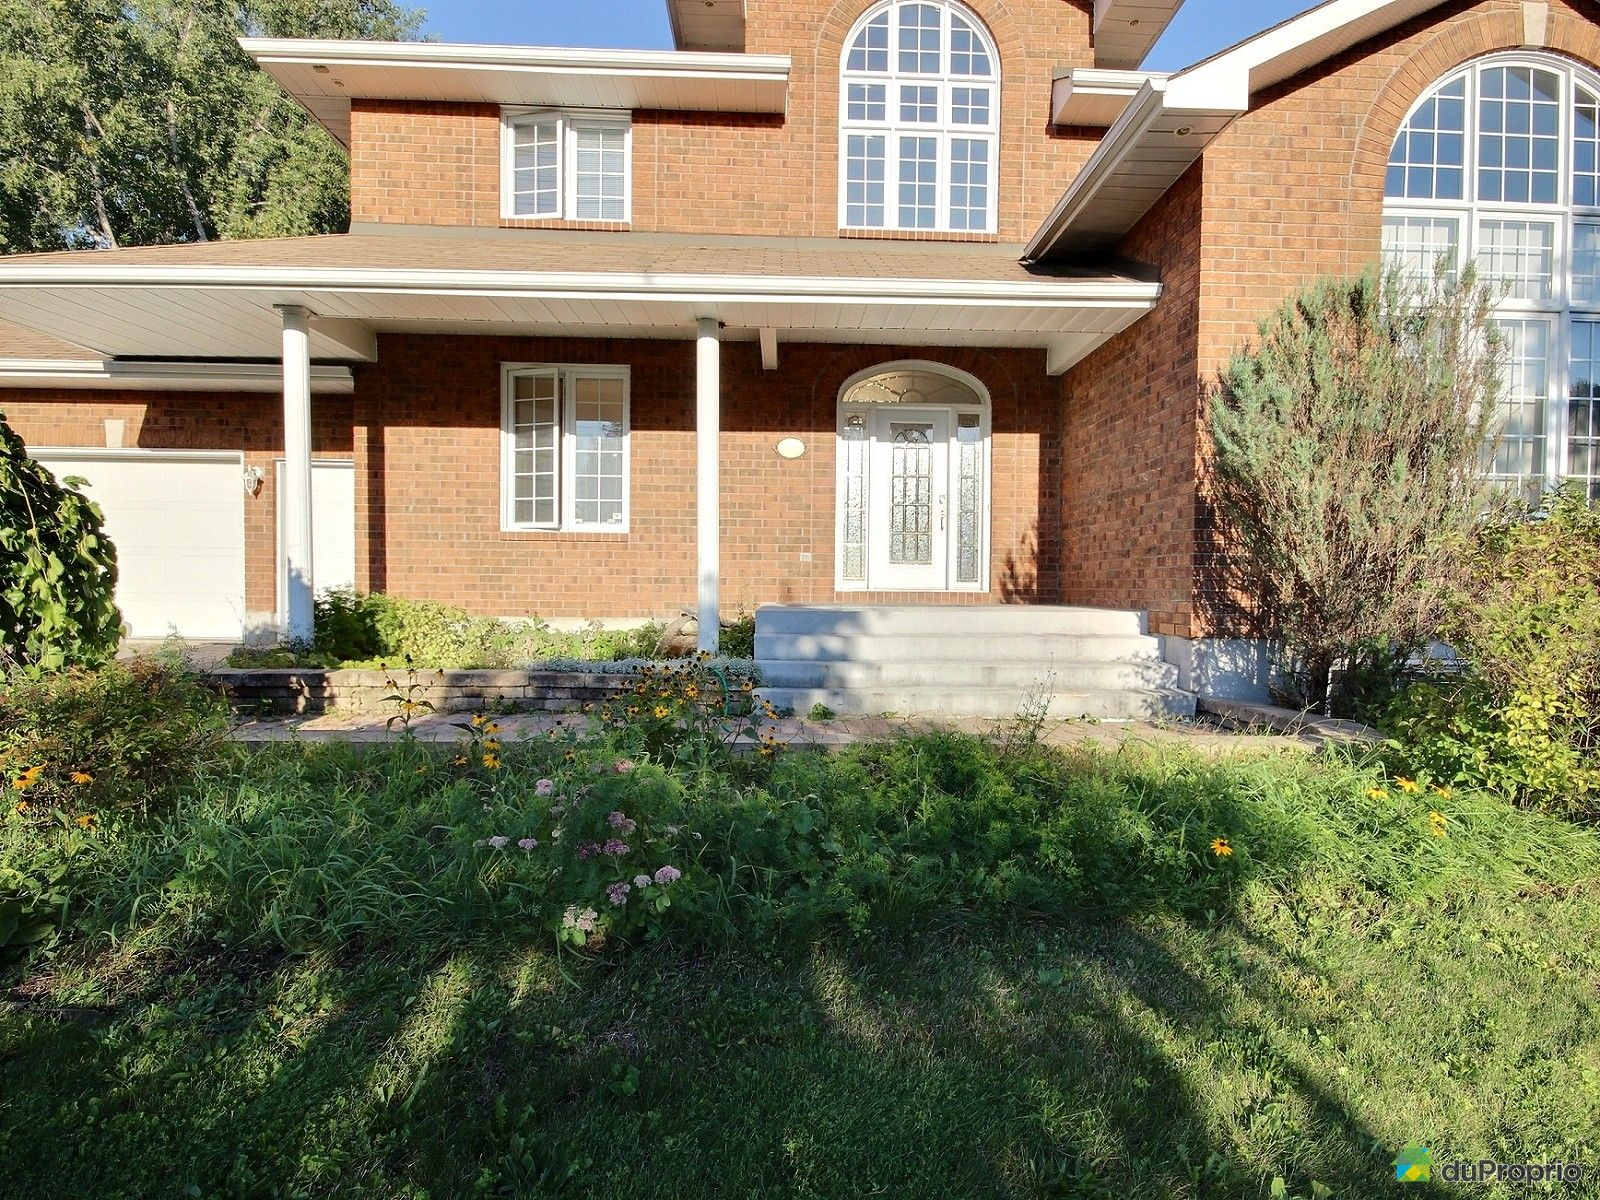 maison vendre aylmer 80 rue des montagnais immobilier qu bec duproprio 640868. Black Bedroom Furniture Sets. Home Design Ideas